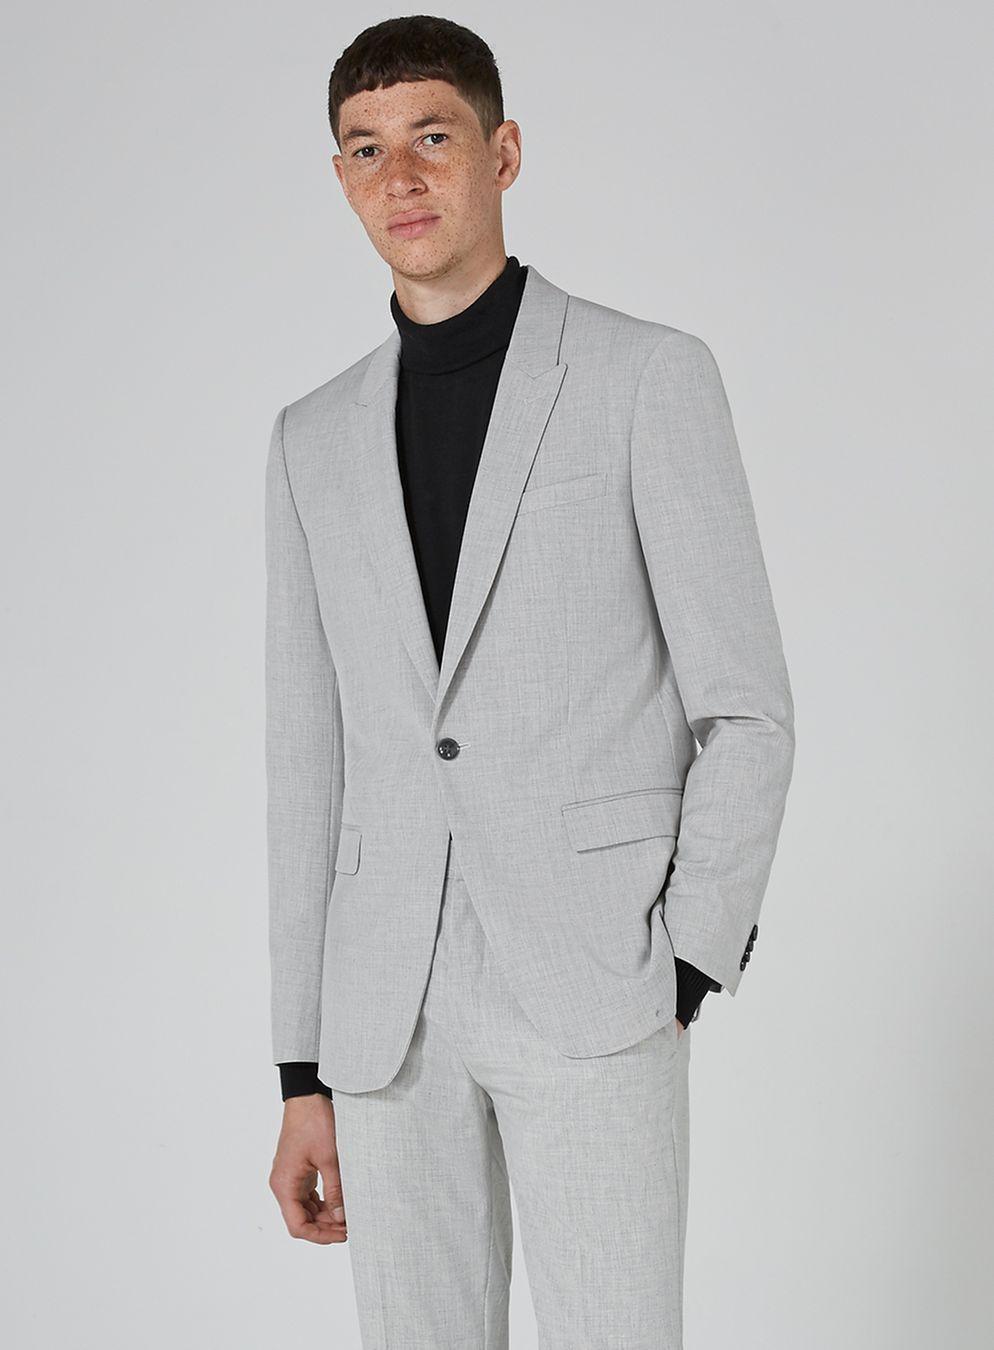 f1b50a2ef26f Light Gray Marl Skinny Fit Suit | weddin' threads in 2019 | Skinny ...